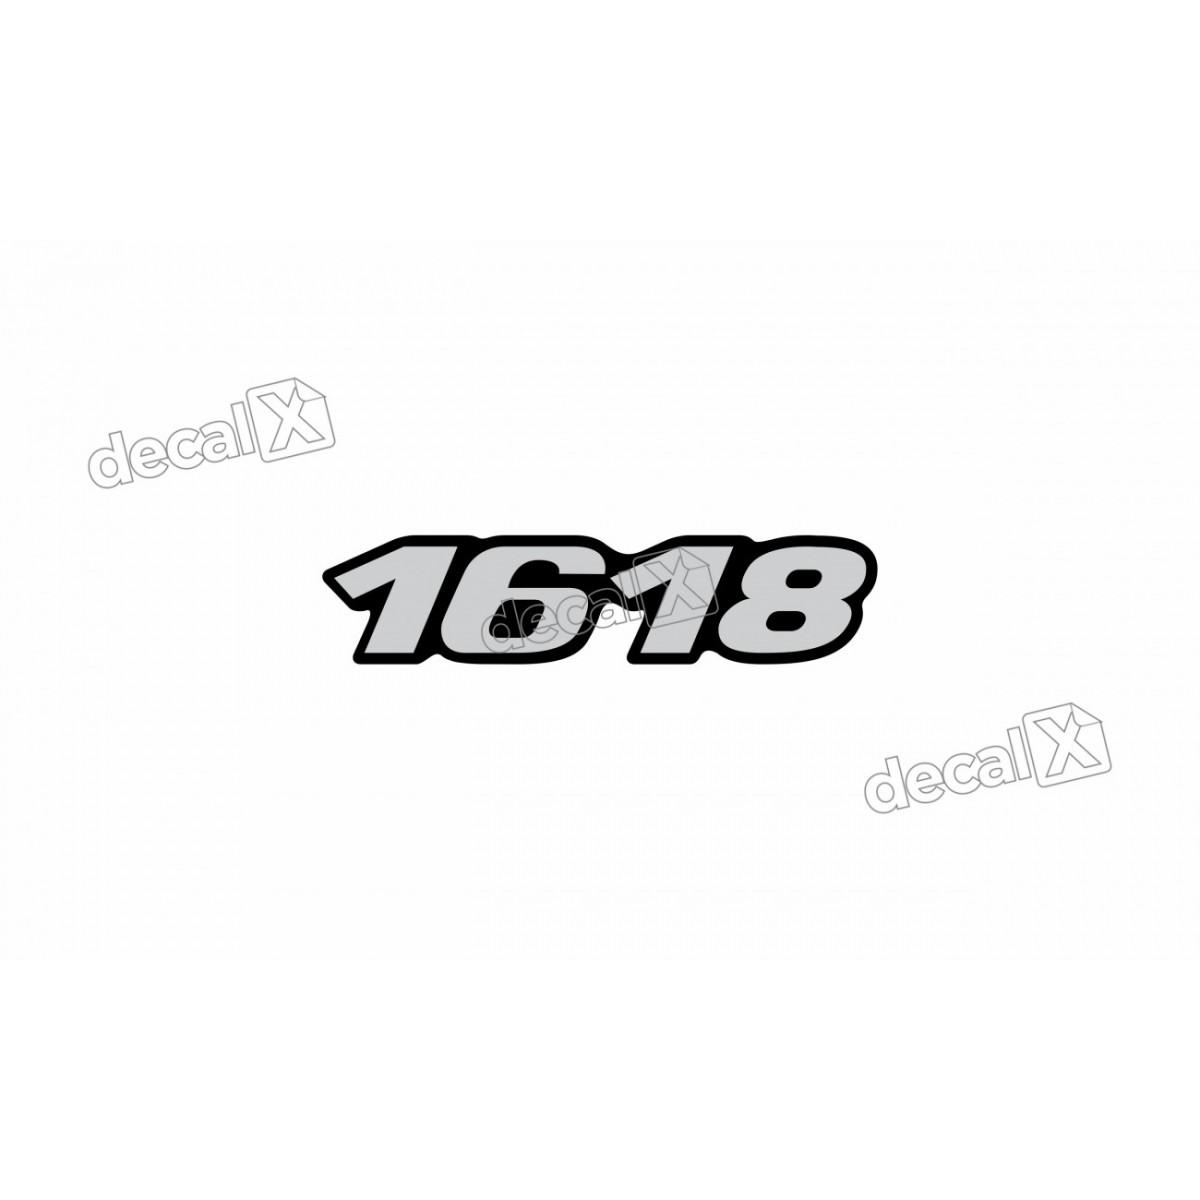 Adesivo Emblema Resinado Mercedes 1618 Cm44 Decalx